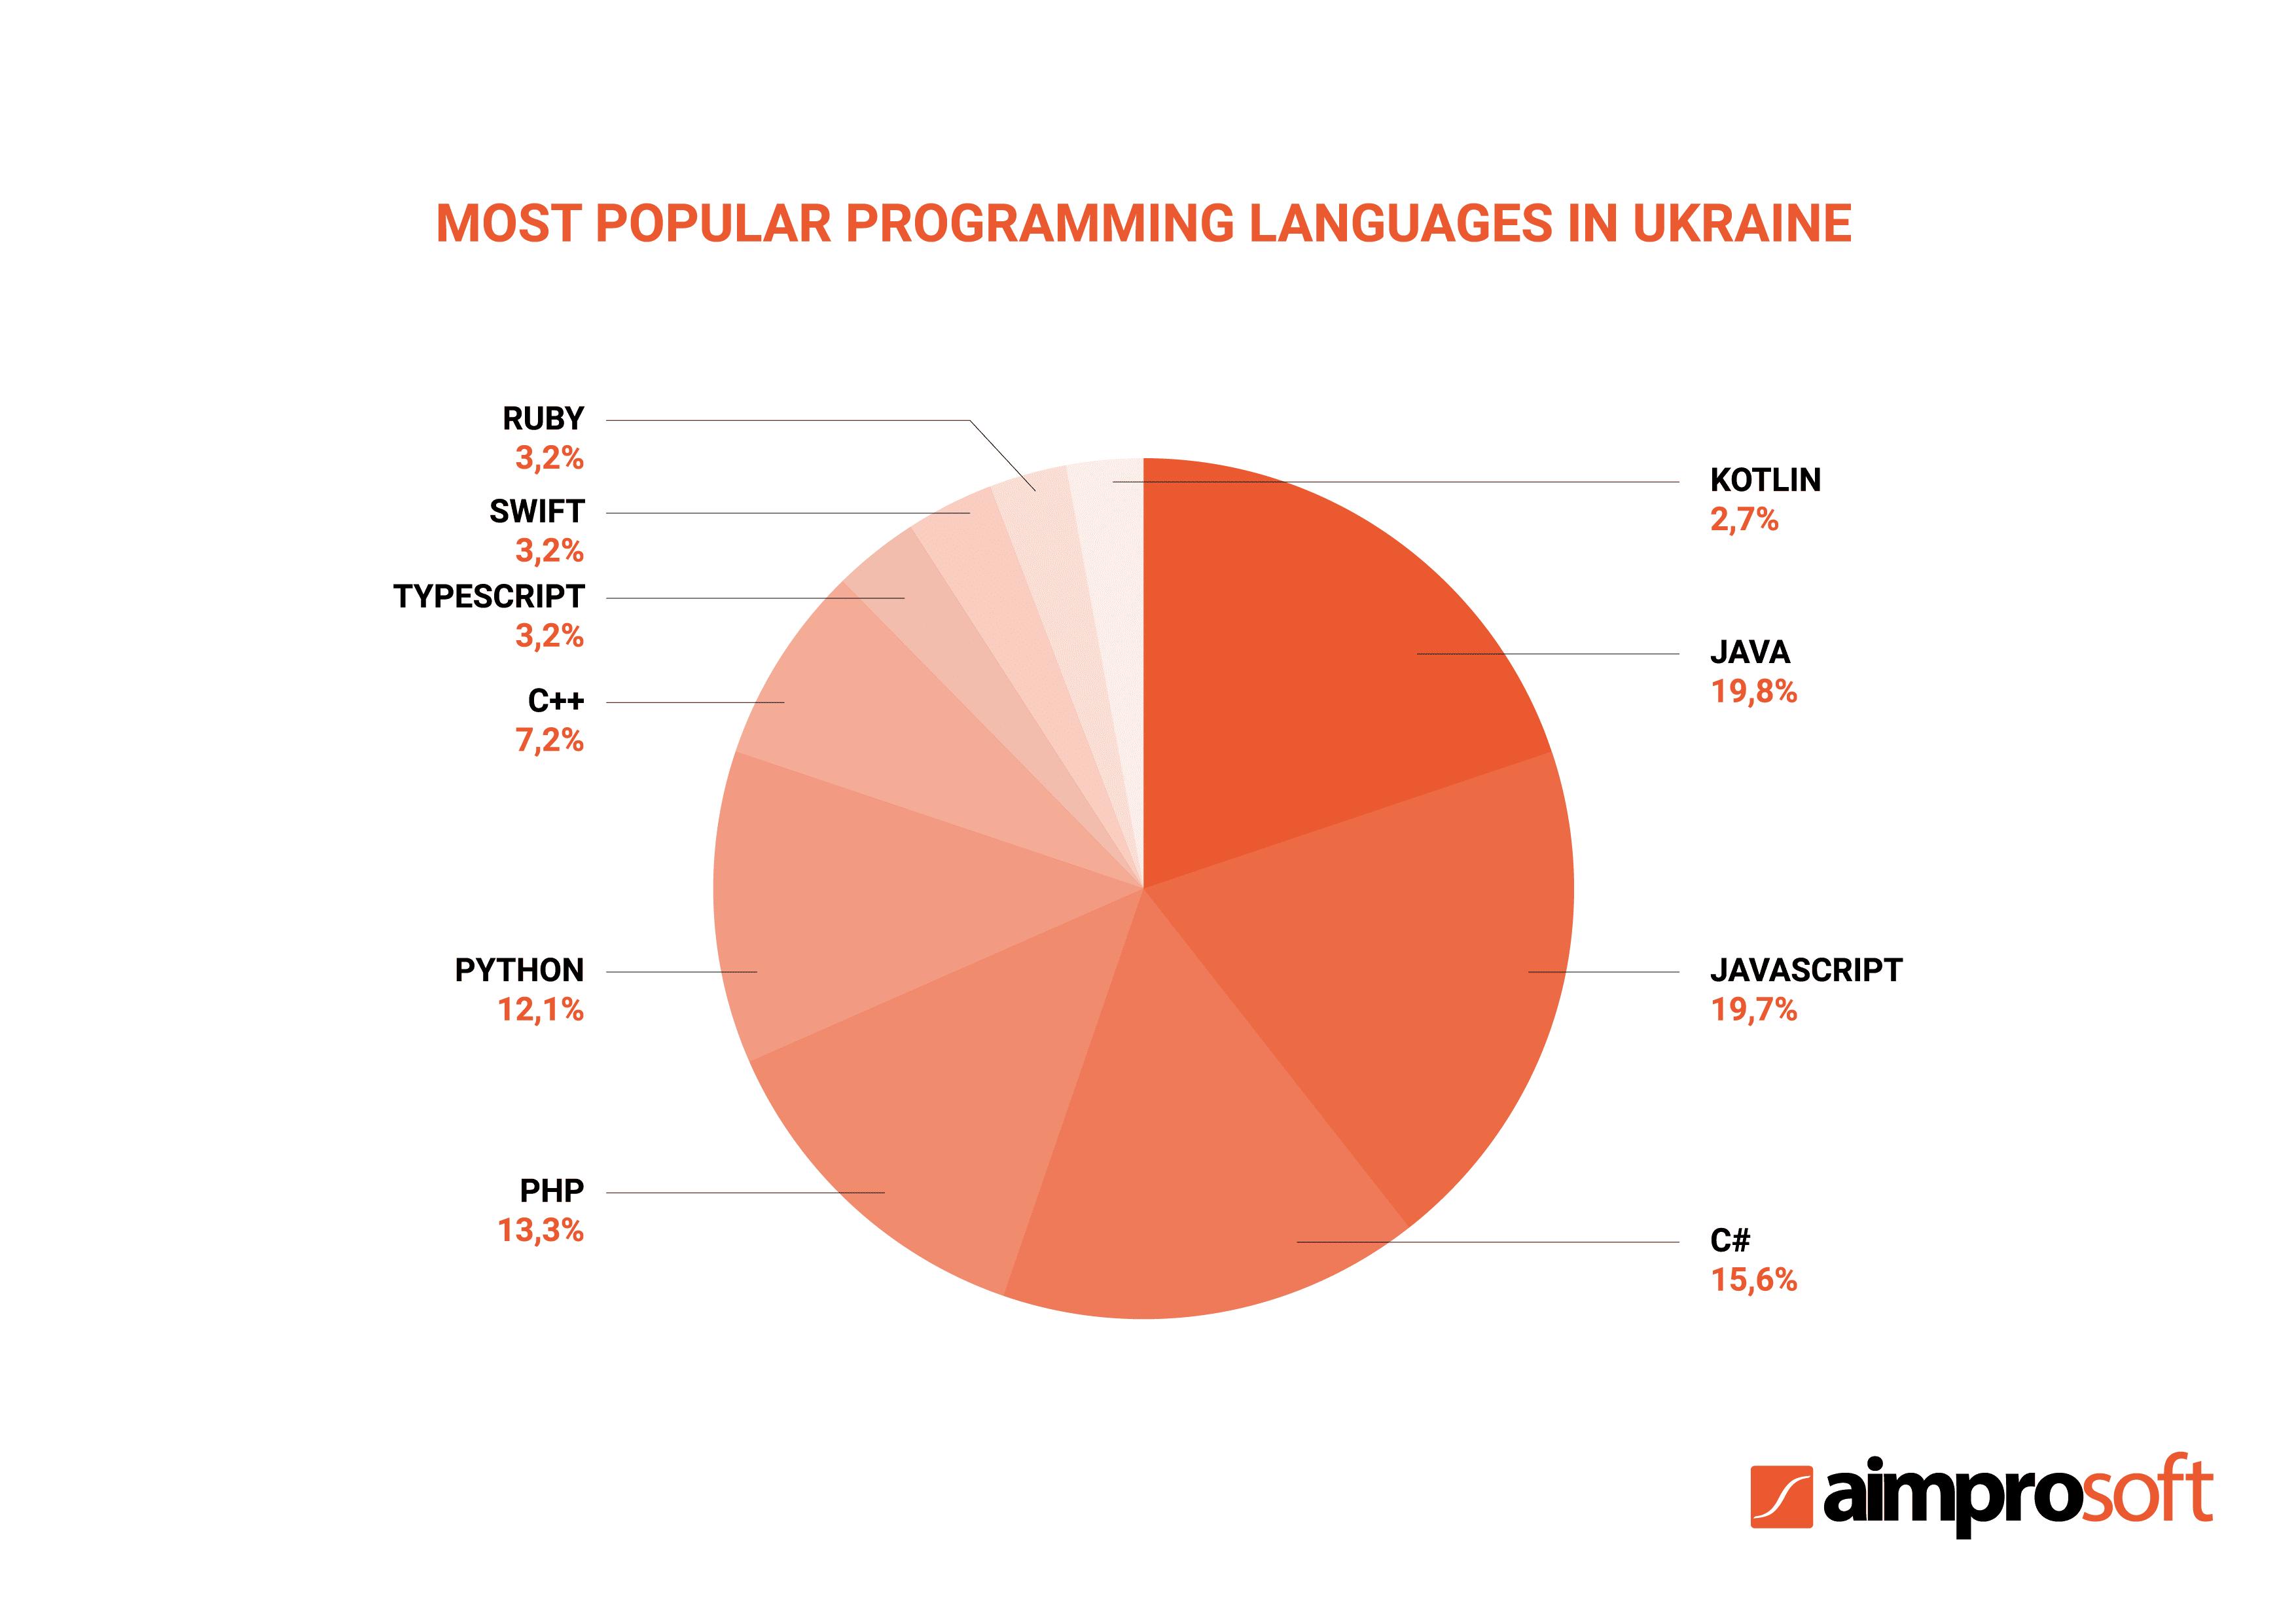 Most popular programming languages in Ukraine